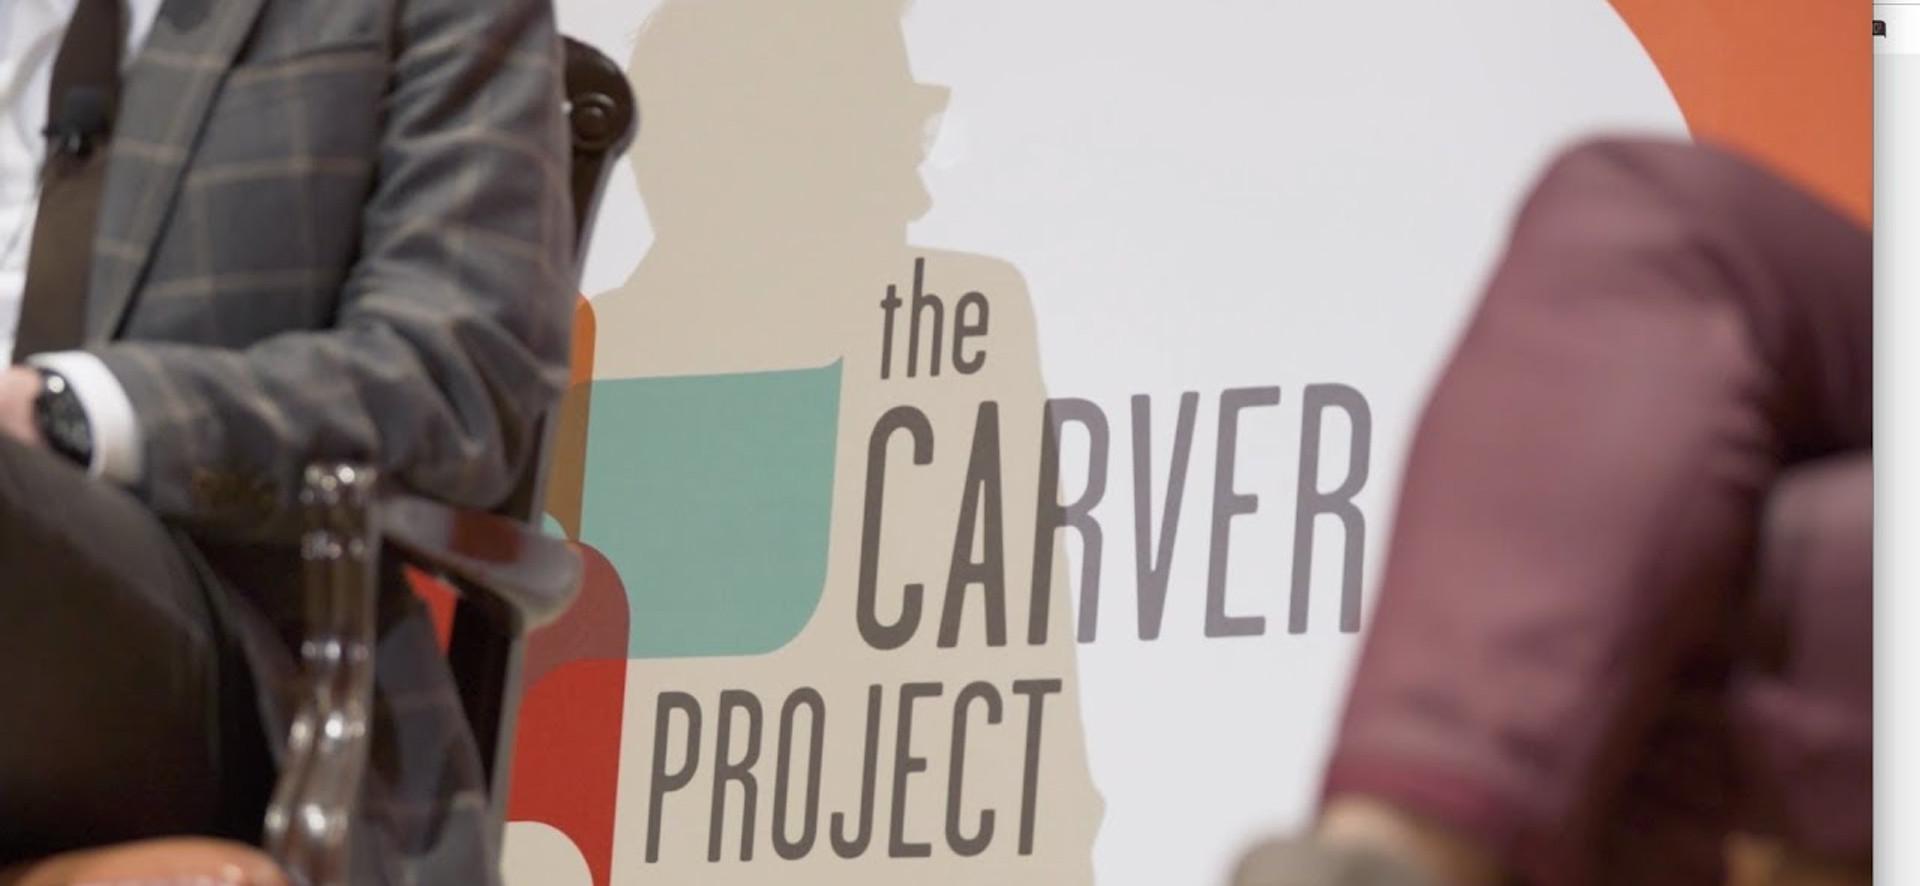 The Carver Conversations feat. Sho Baraka, Mako Fujimura, & Sara Groves